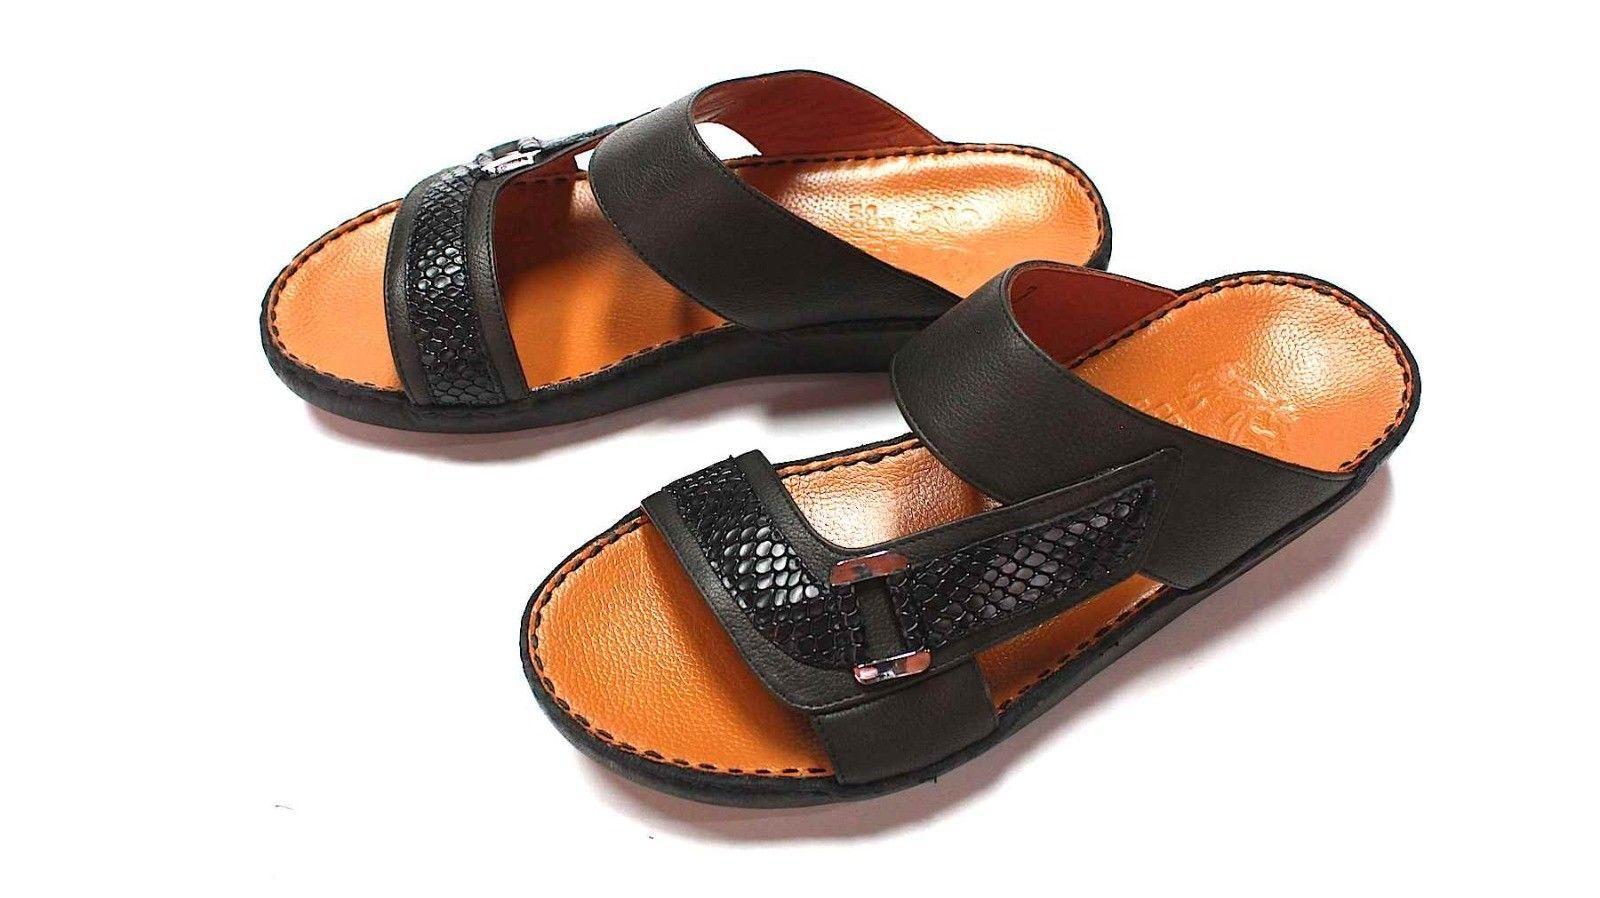 5b92a78e2e17 Mens Shoes 45054  Arab - Muslim - Arabic Sandal